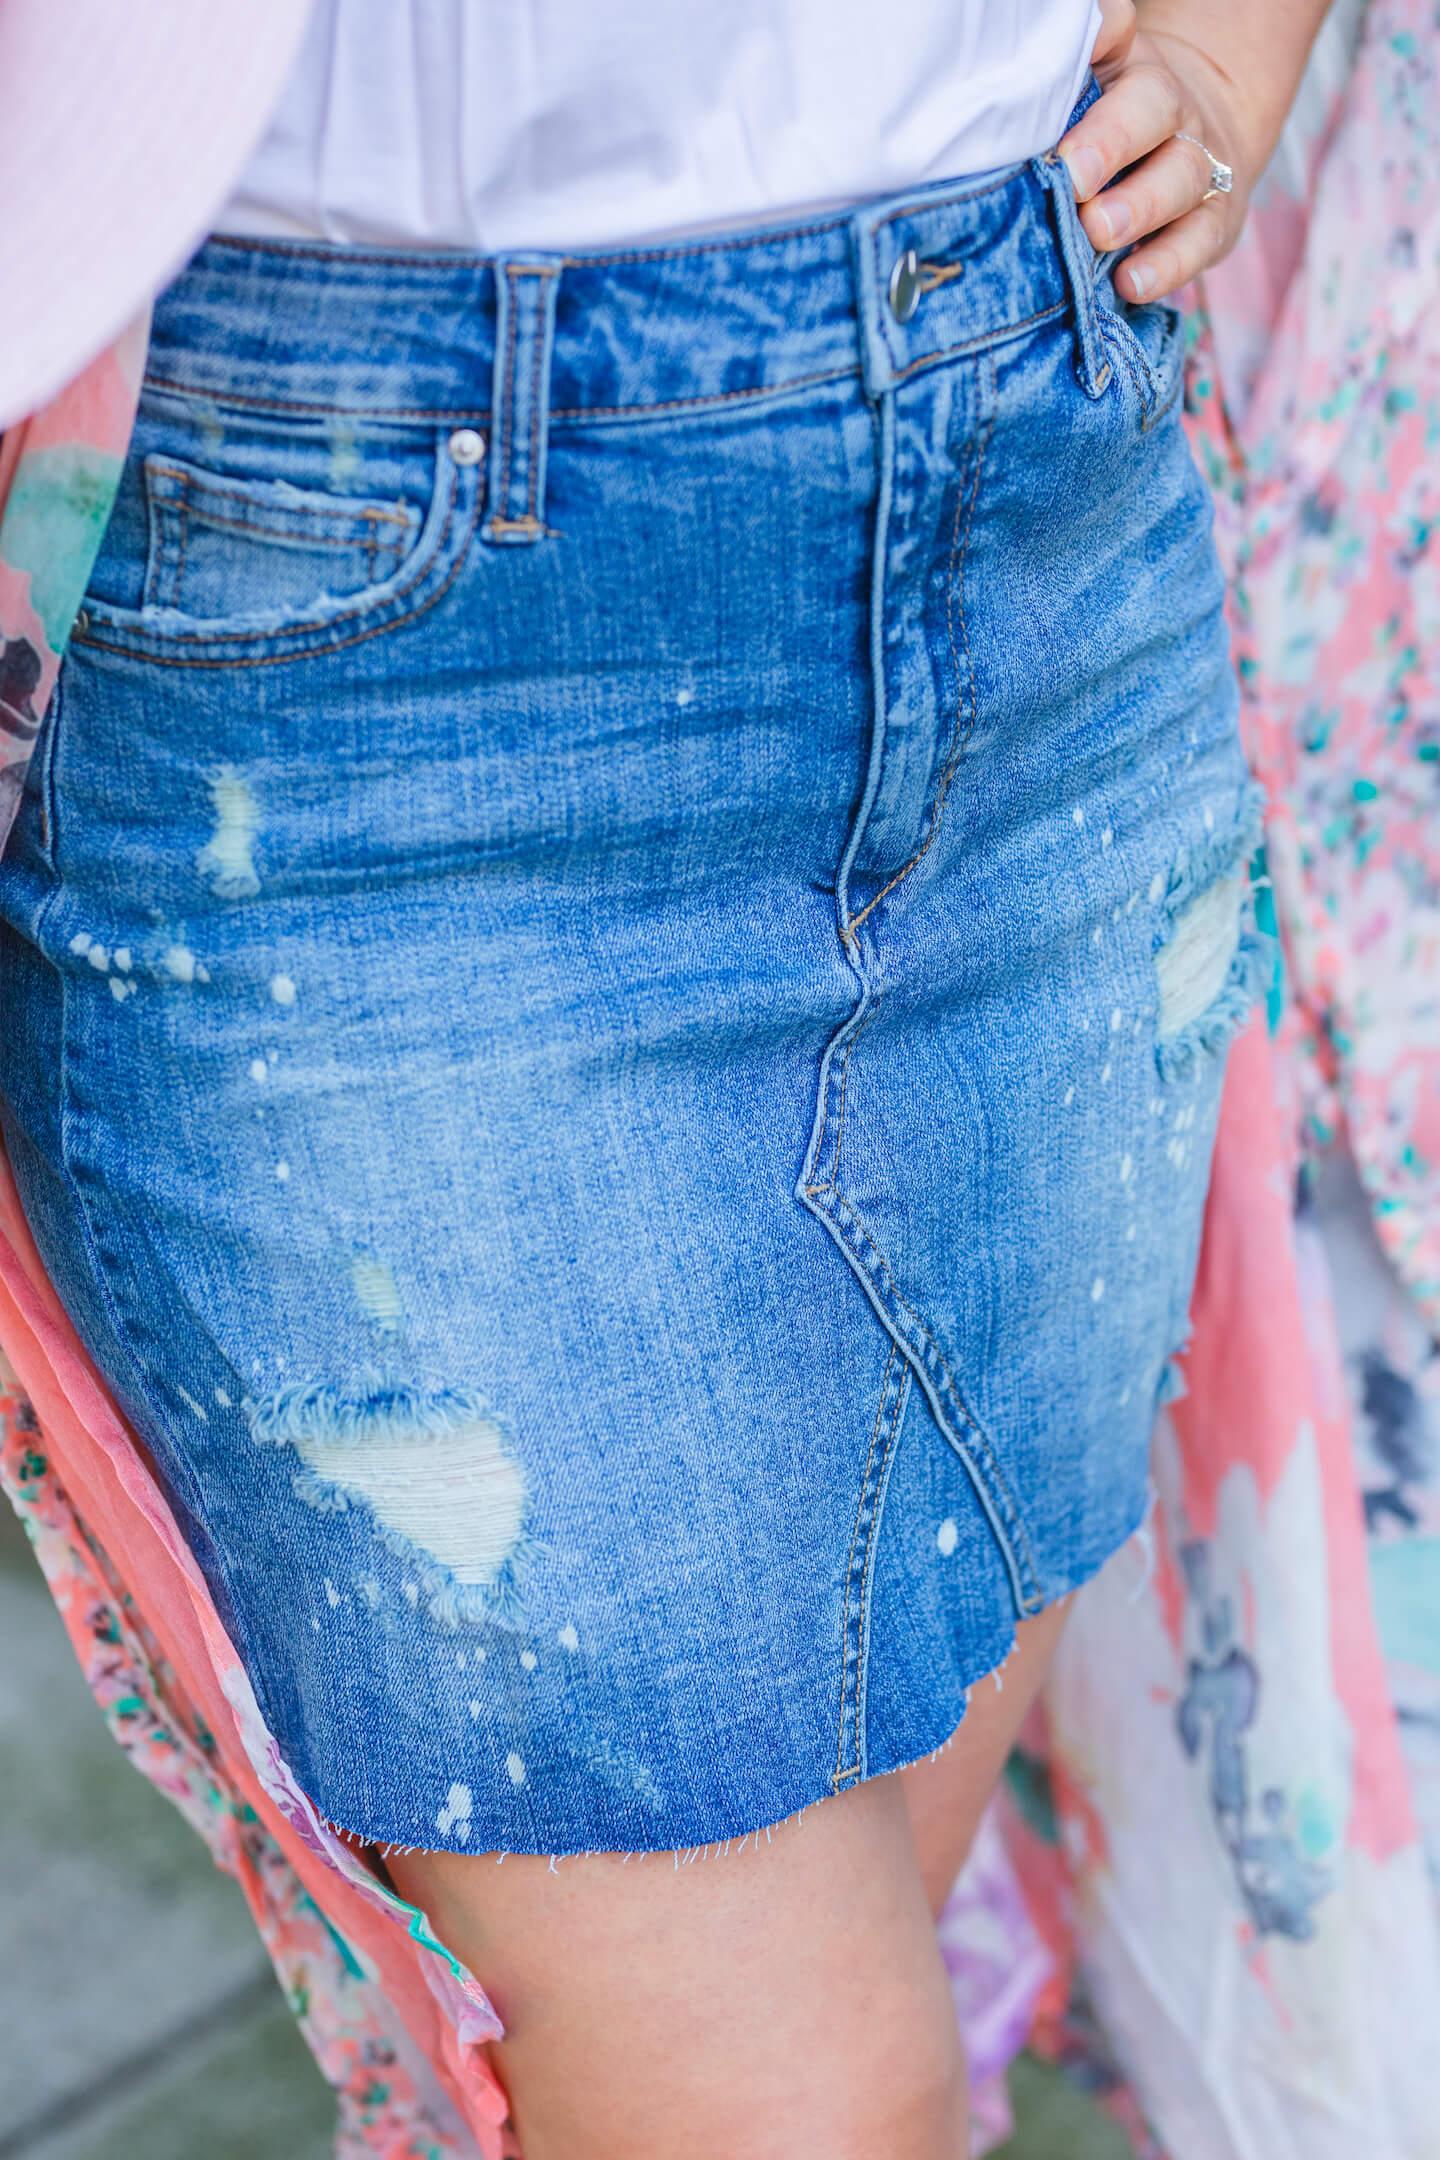 Joe's Jeans Denim Skirt Anthro Kimono Chloe Shoes Look by Modnitsa Styling